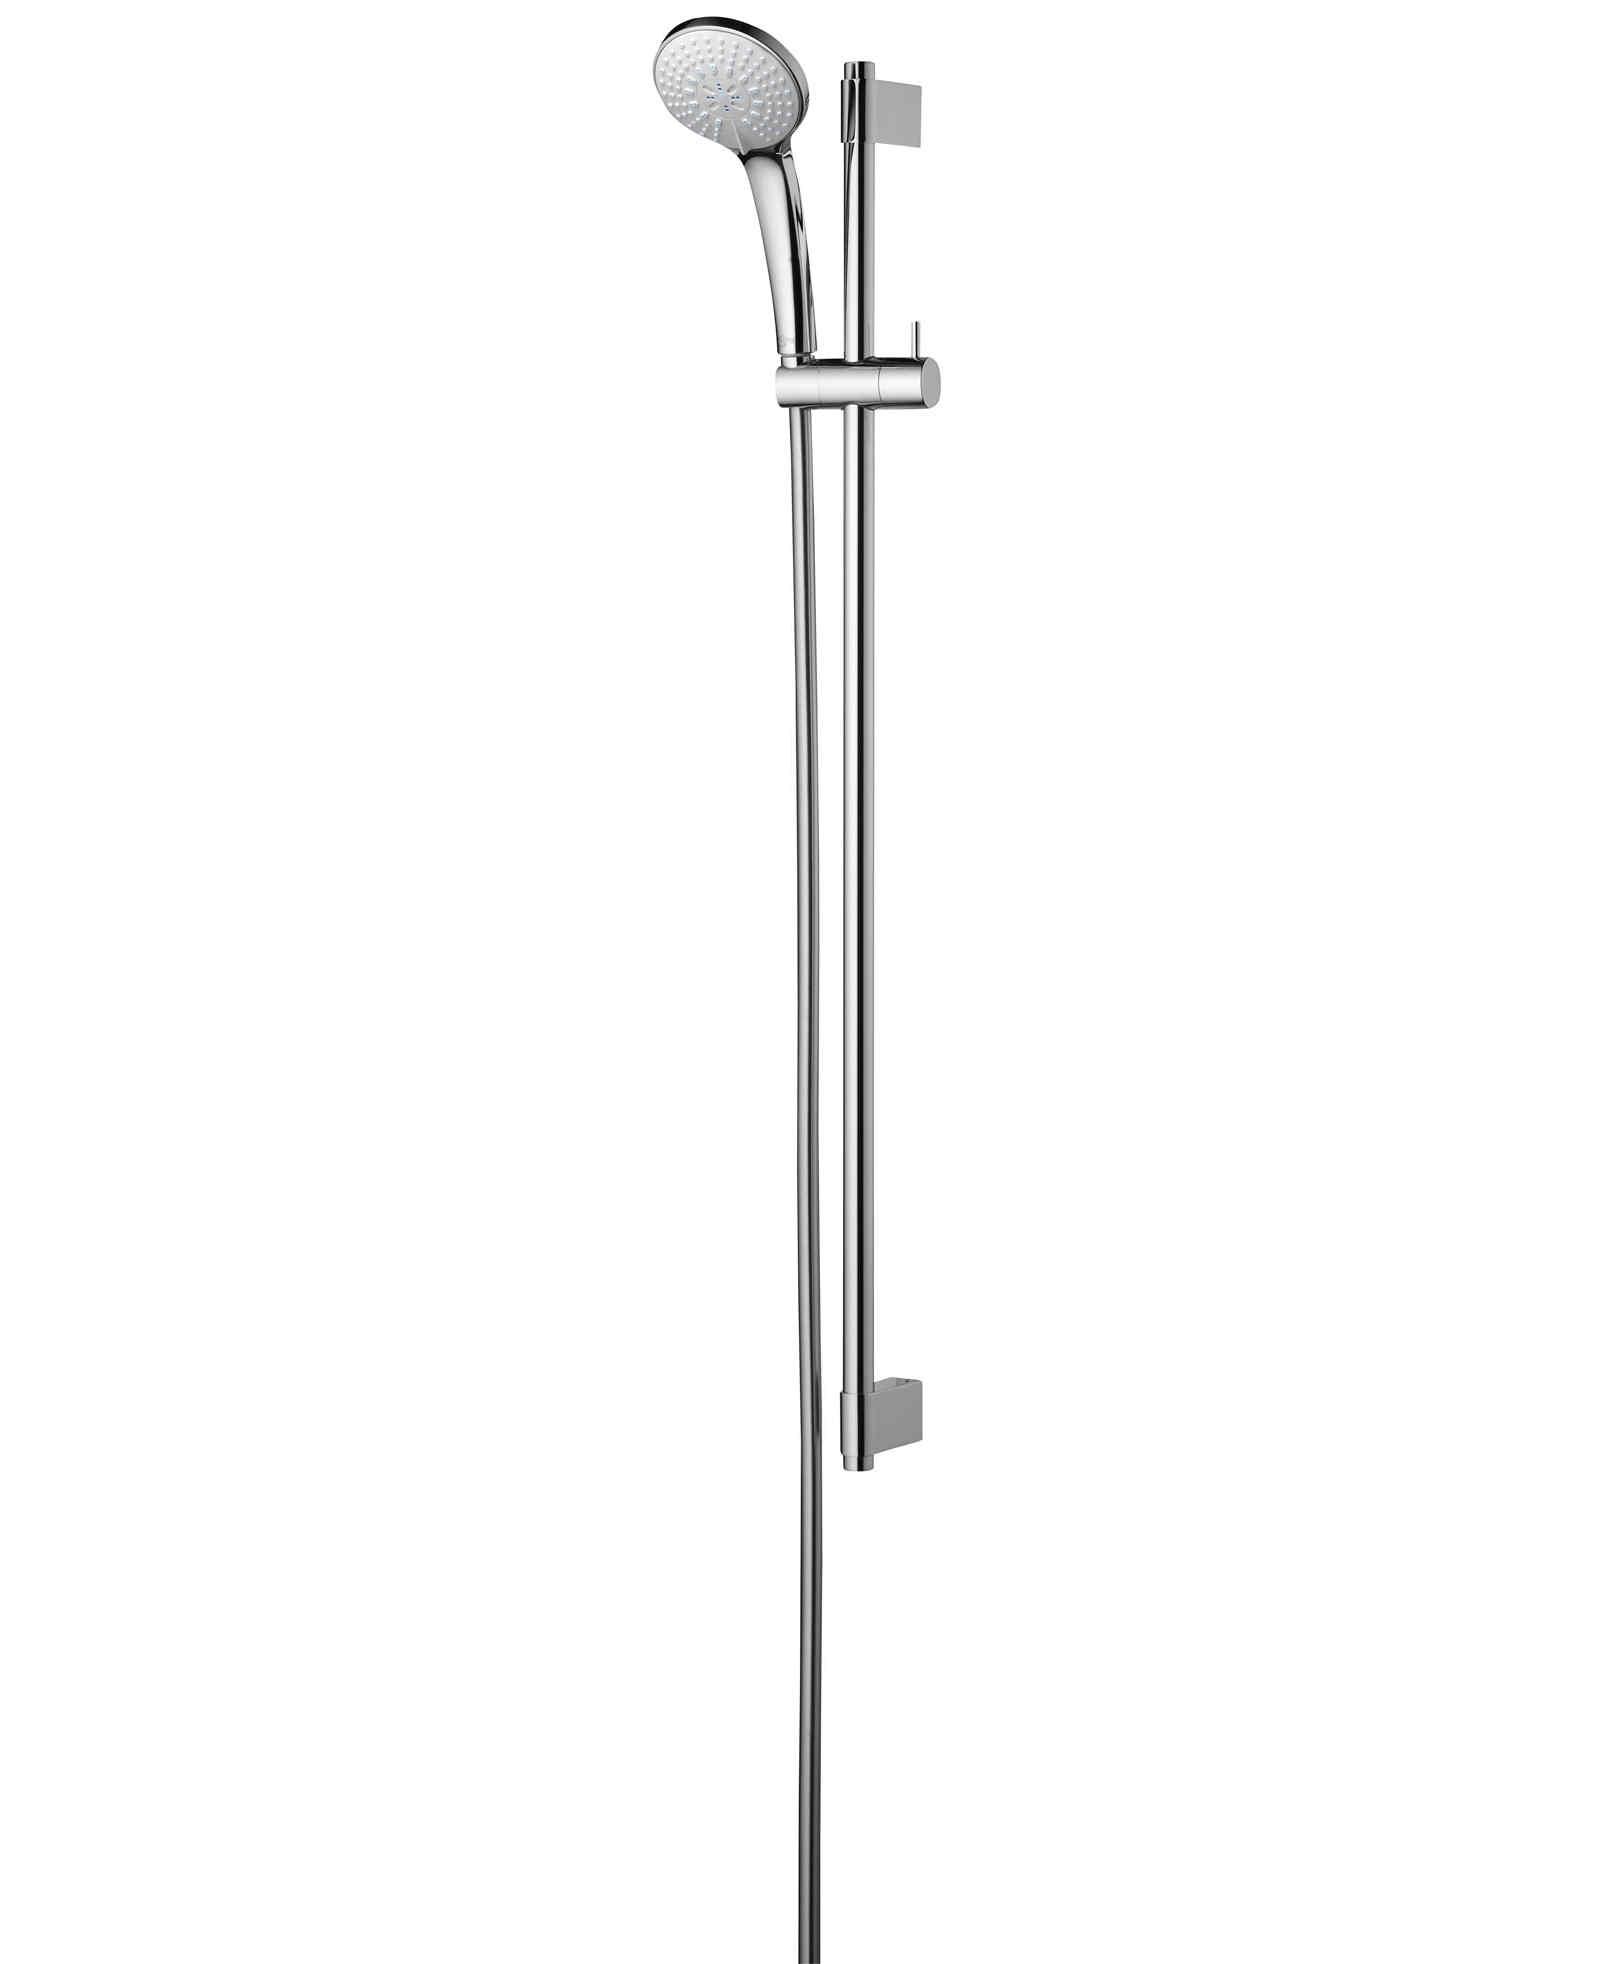 ideal standard idealrain pro m3 chrome shower kit. Black Bedroom Furniture Sets. Home Design Ideas